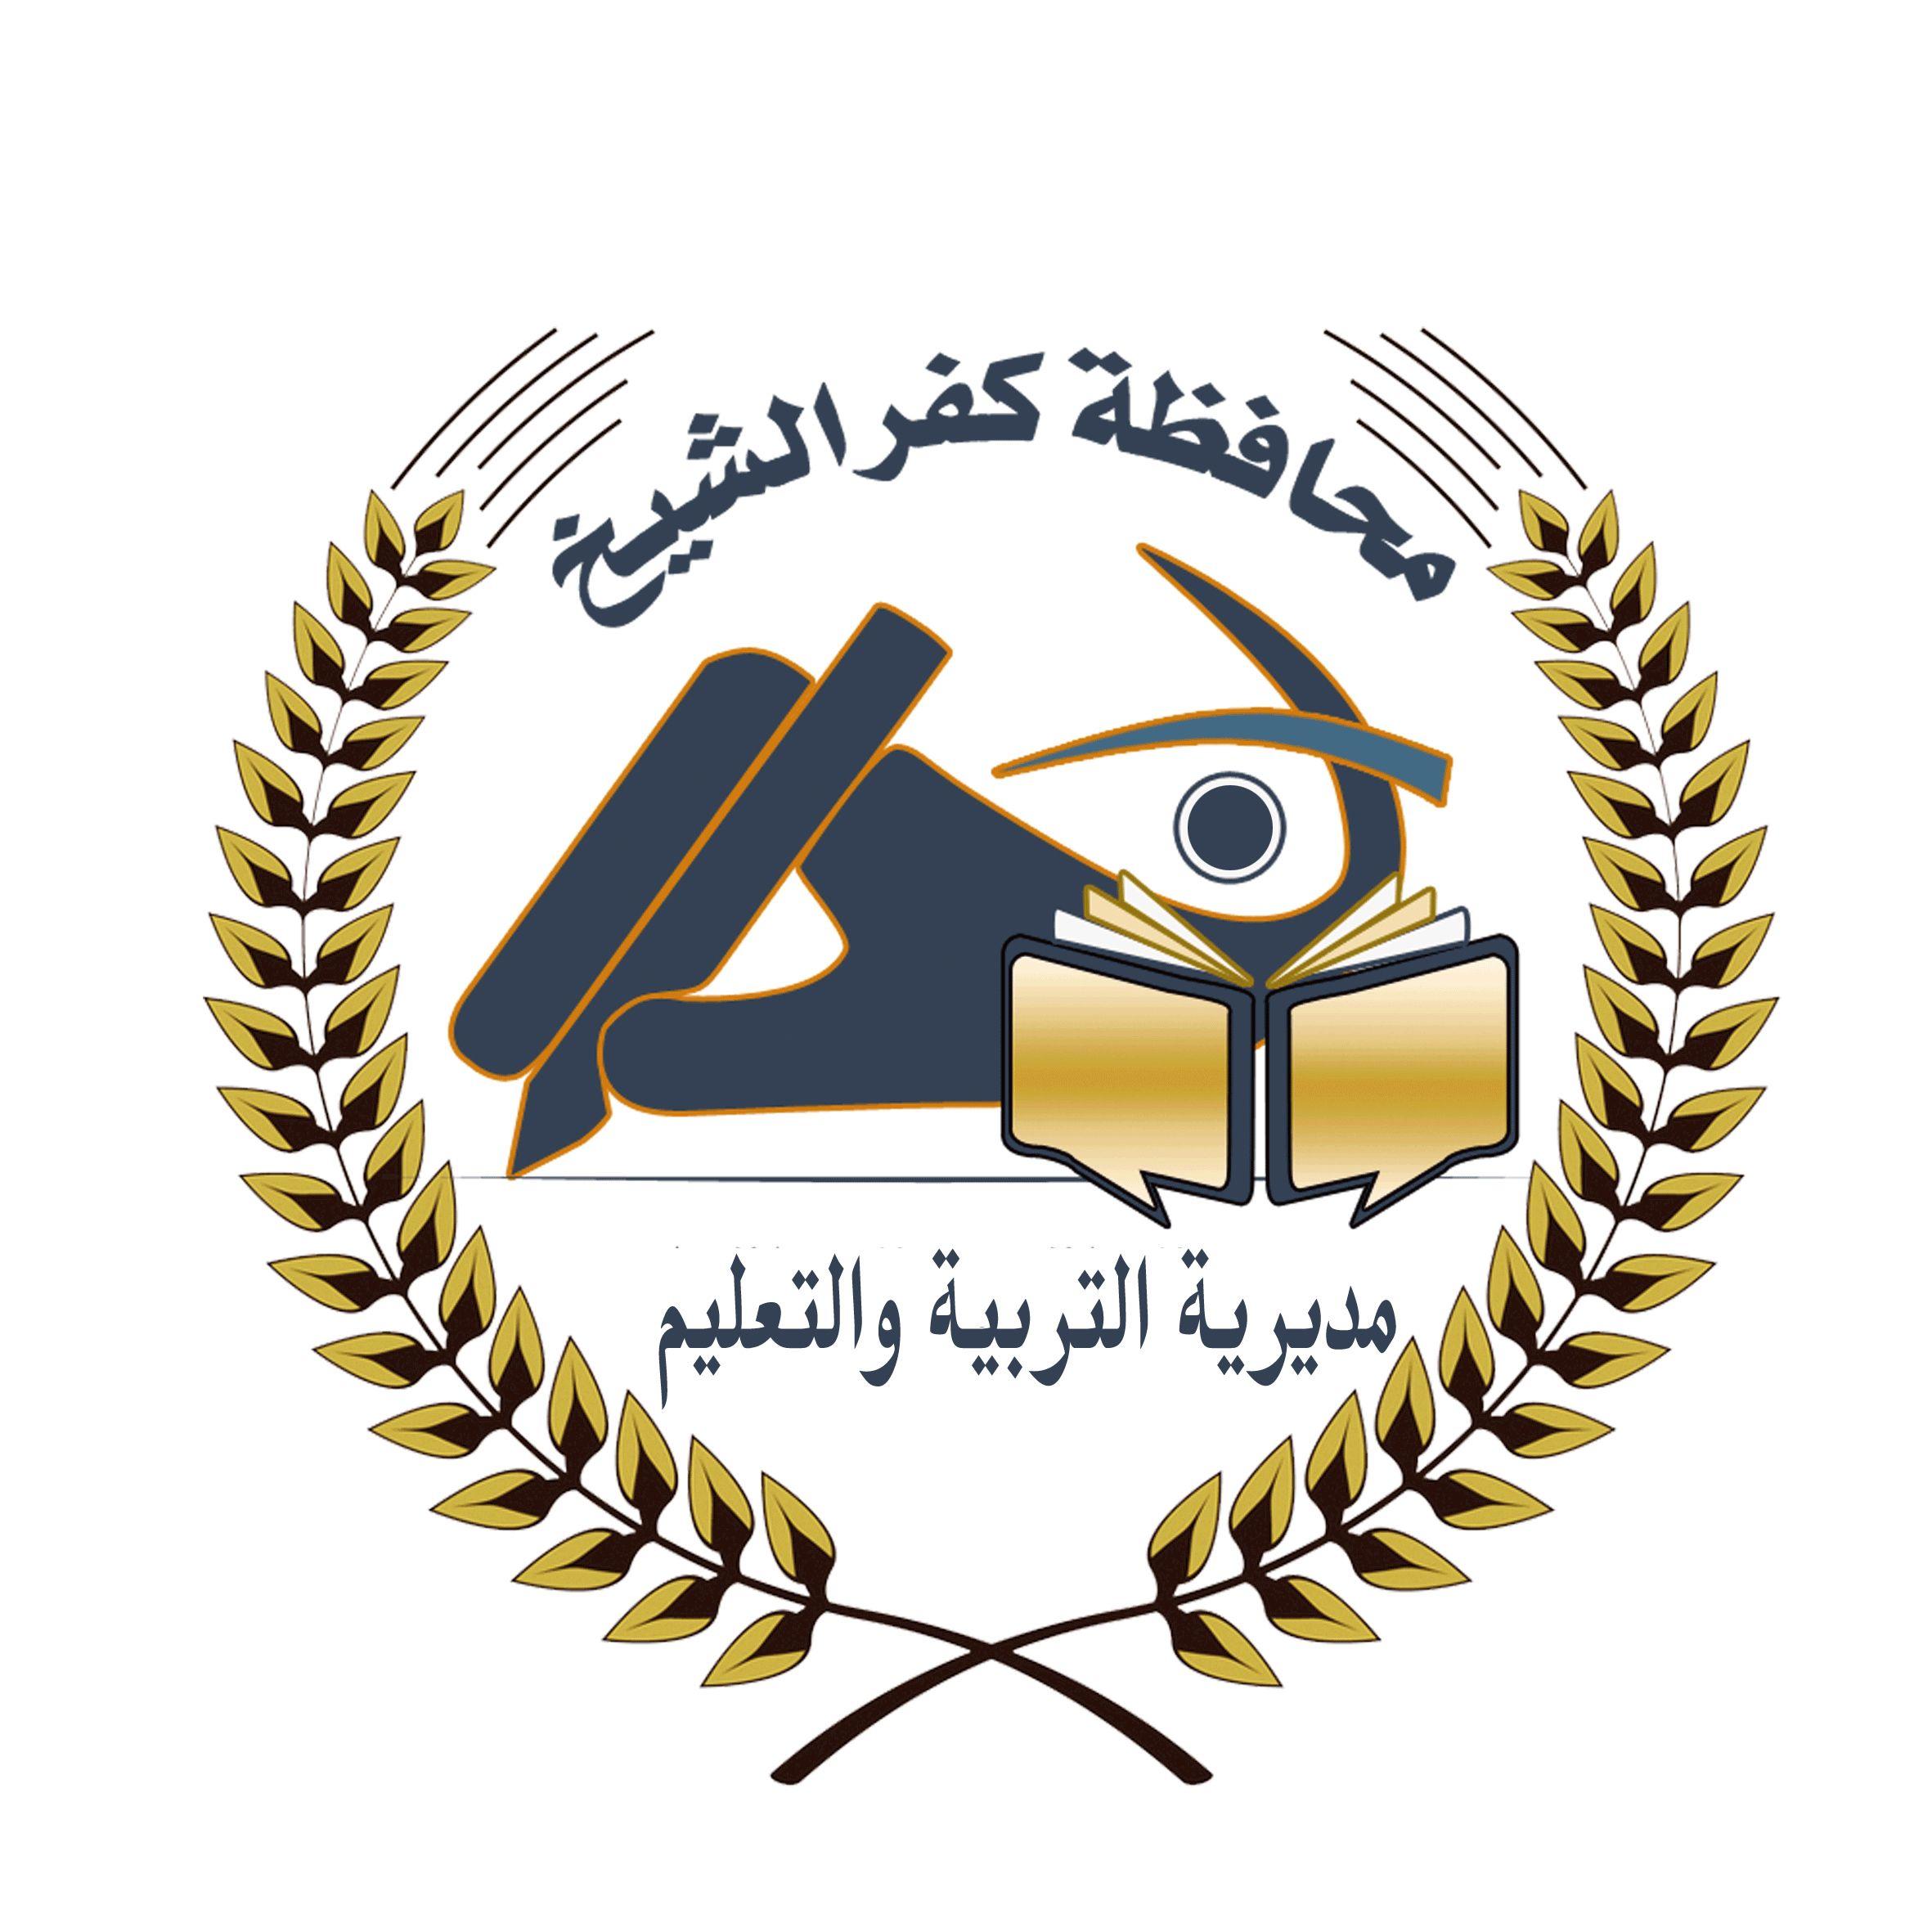 Pin By Mozkarat On مذكرات مراجعات أبحاث اسطوانات امتحانات Arabic Calligraphy Calligraphy Logos